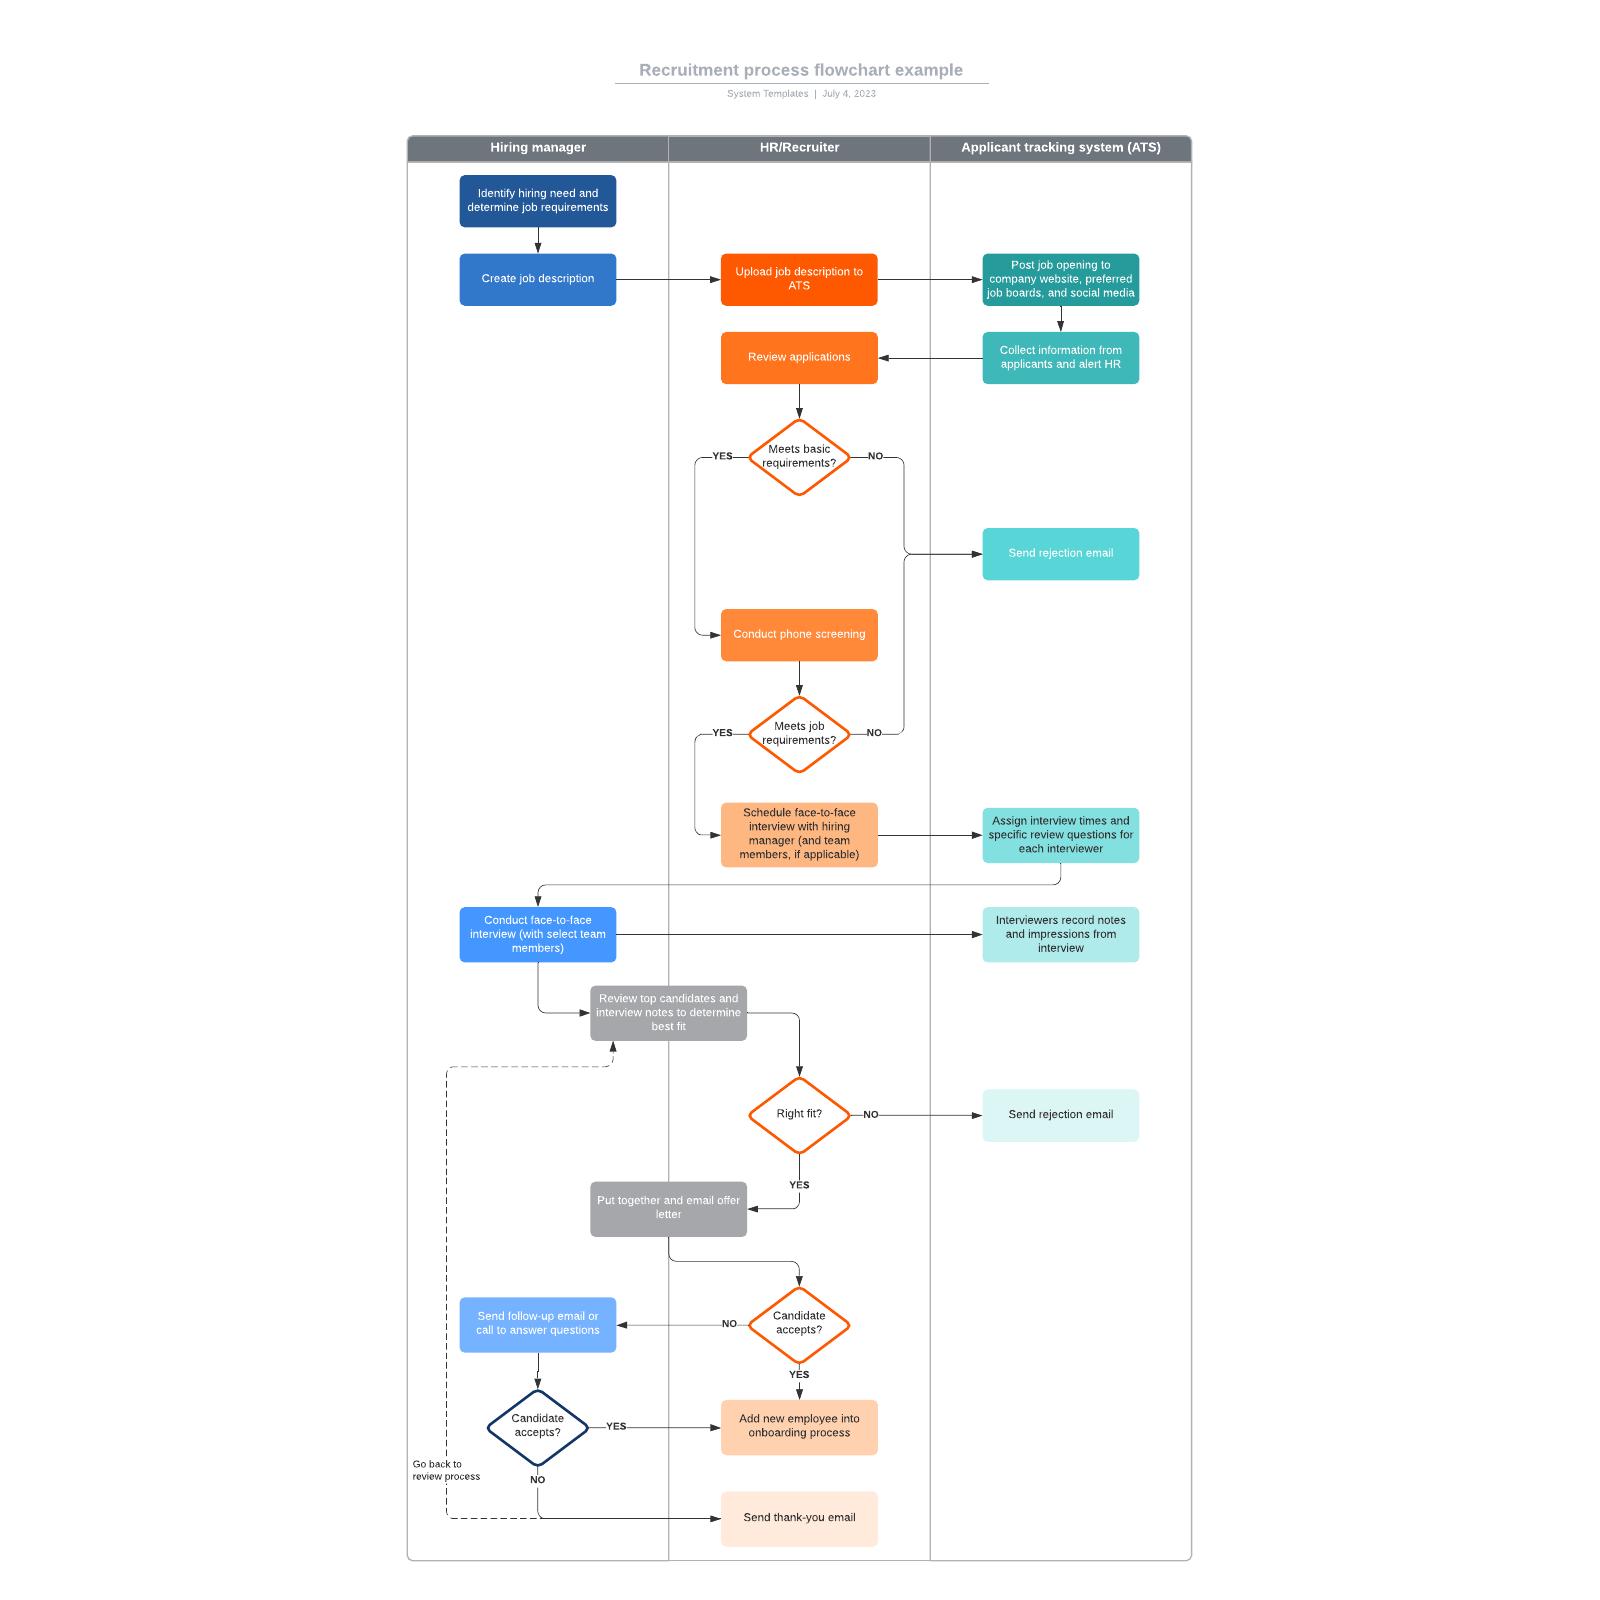 Recruitment process flowchart example